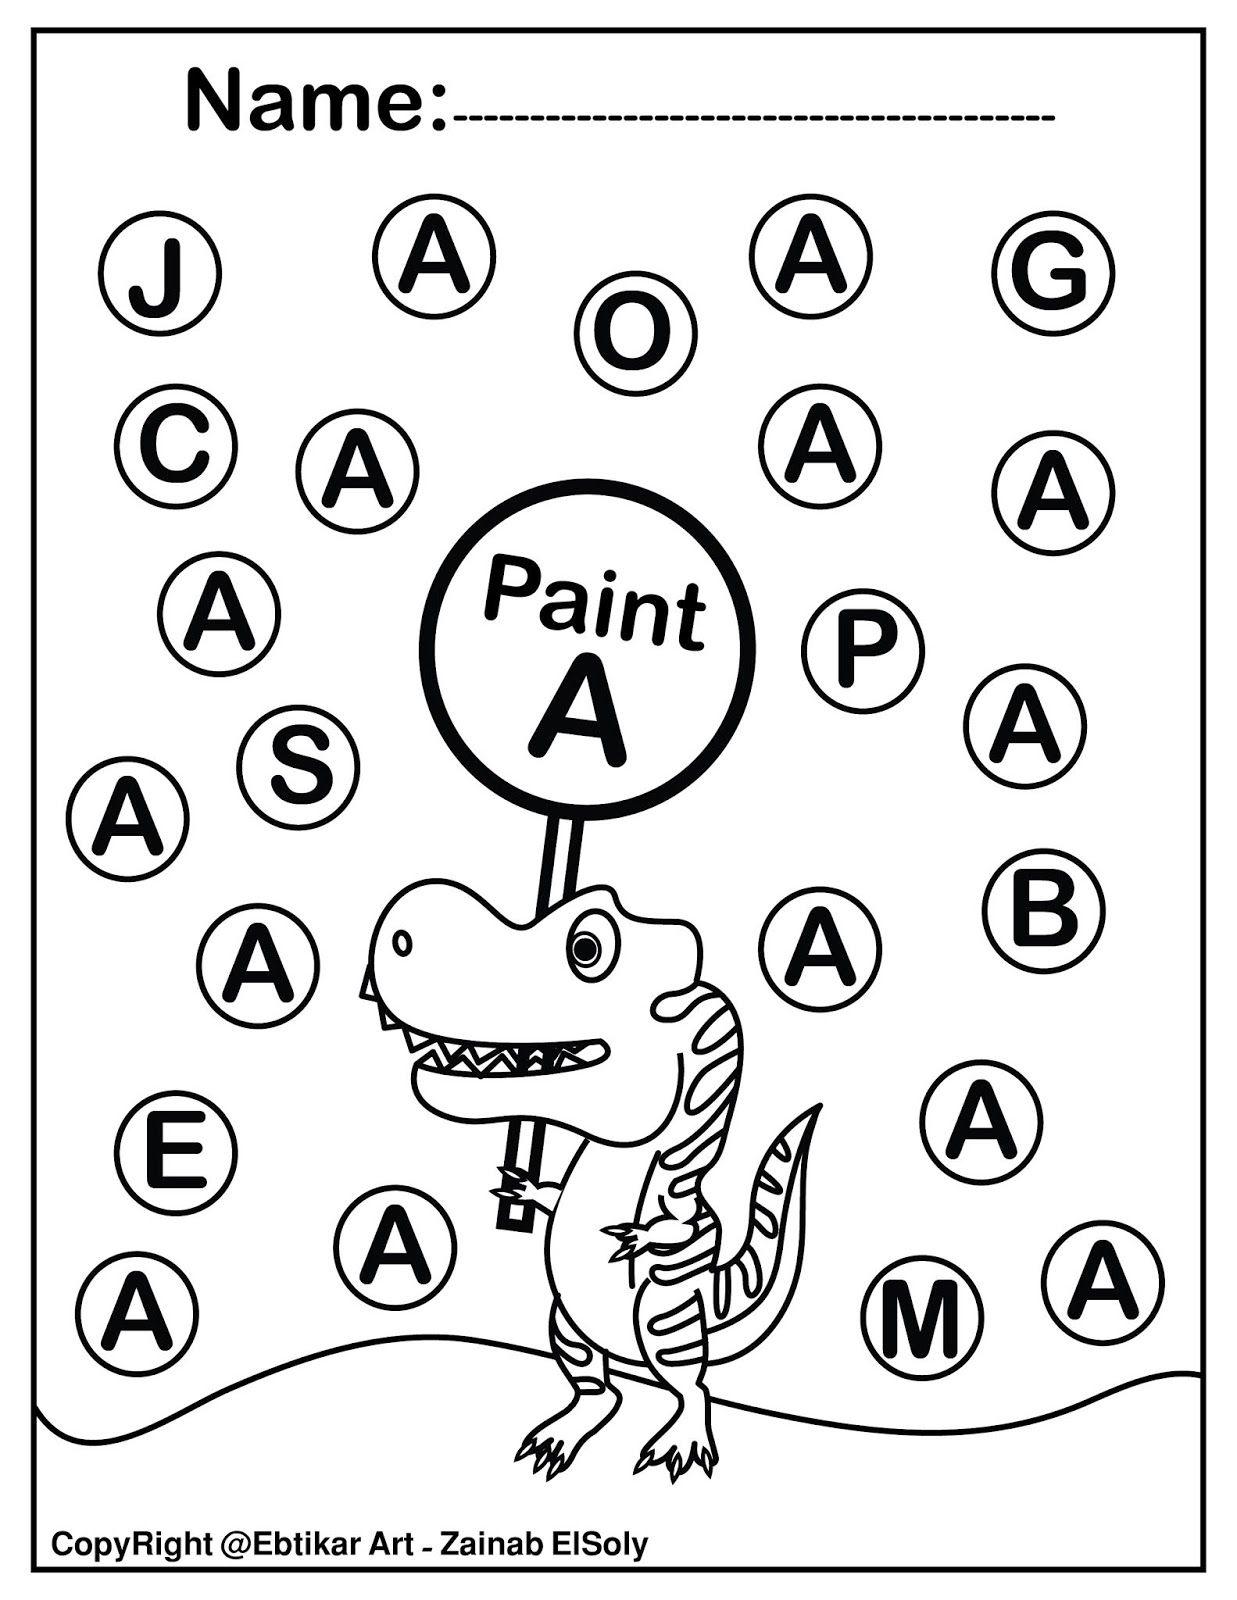 Set Of Abc Dinosaur Trex Activity Paint A Dot Preschool Coloring Sheets Abc Worksheets Abc Coloring Pages Kindergarten Coloring Pages [ 1600 x 1237 Pixel ]